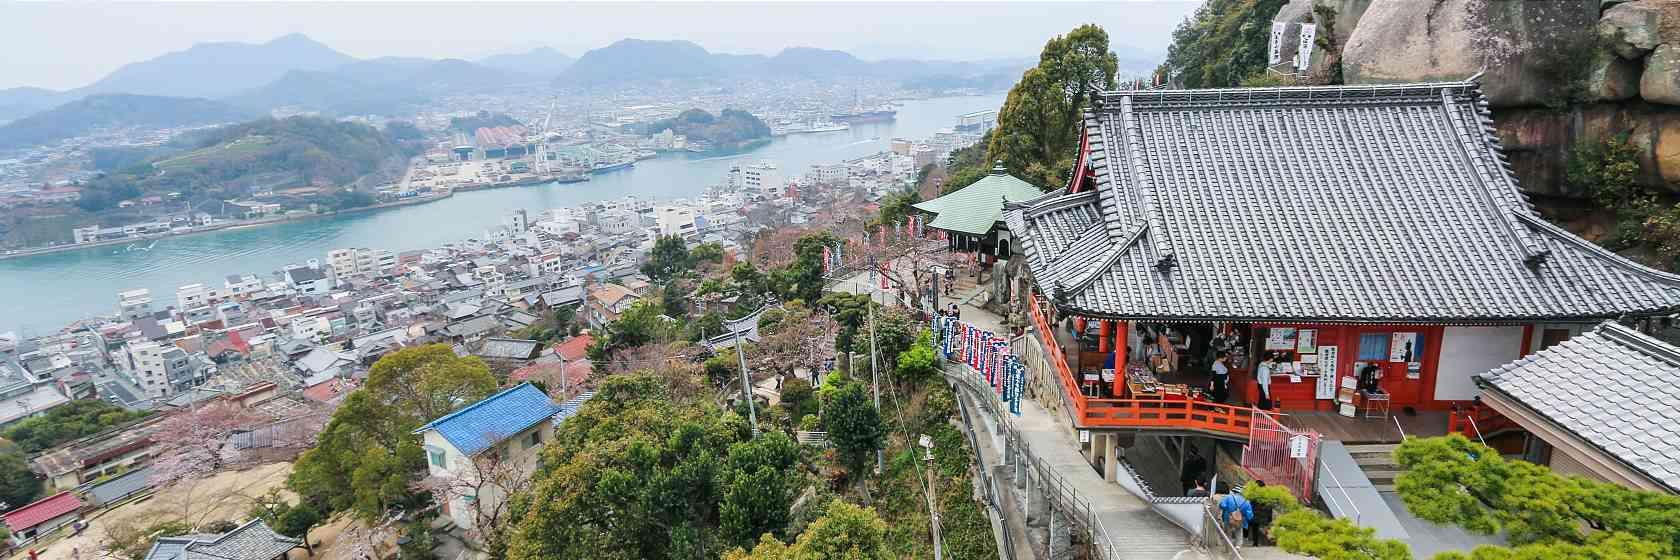 Onomichi - GaijinPot Travel